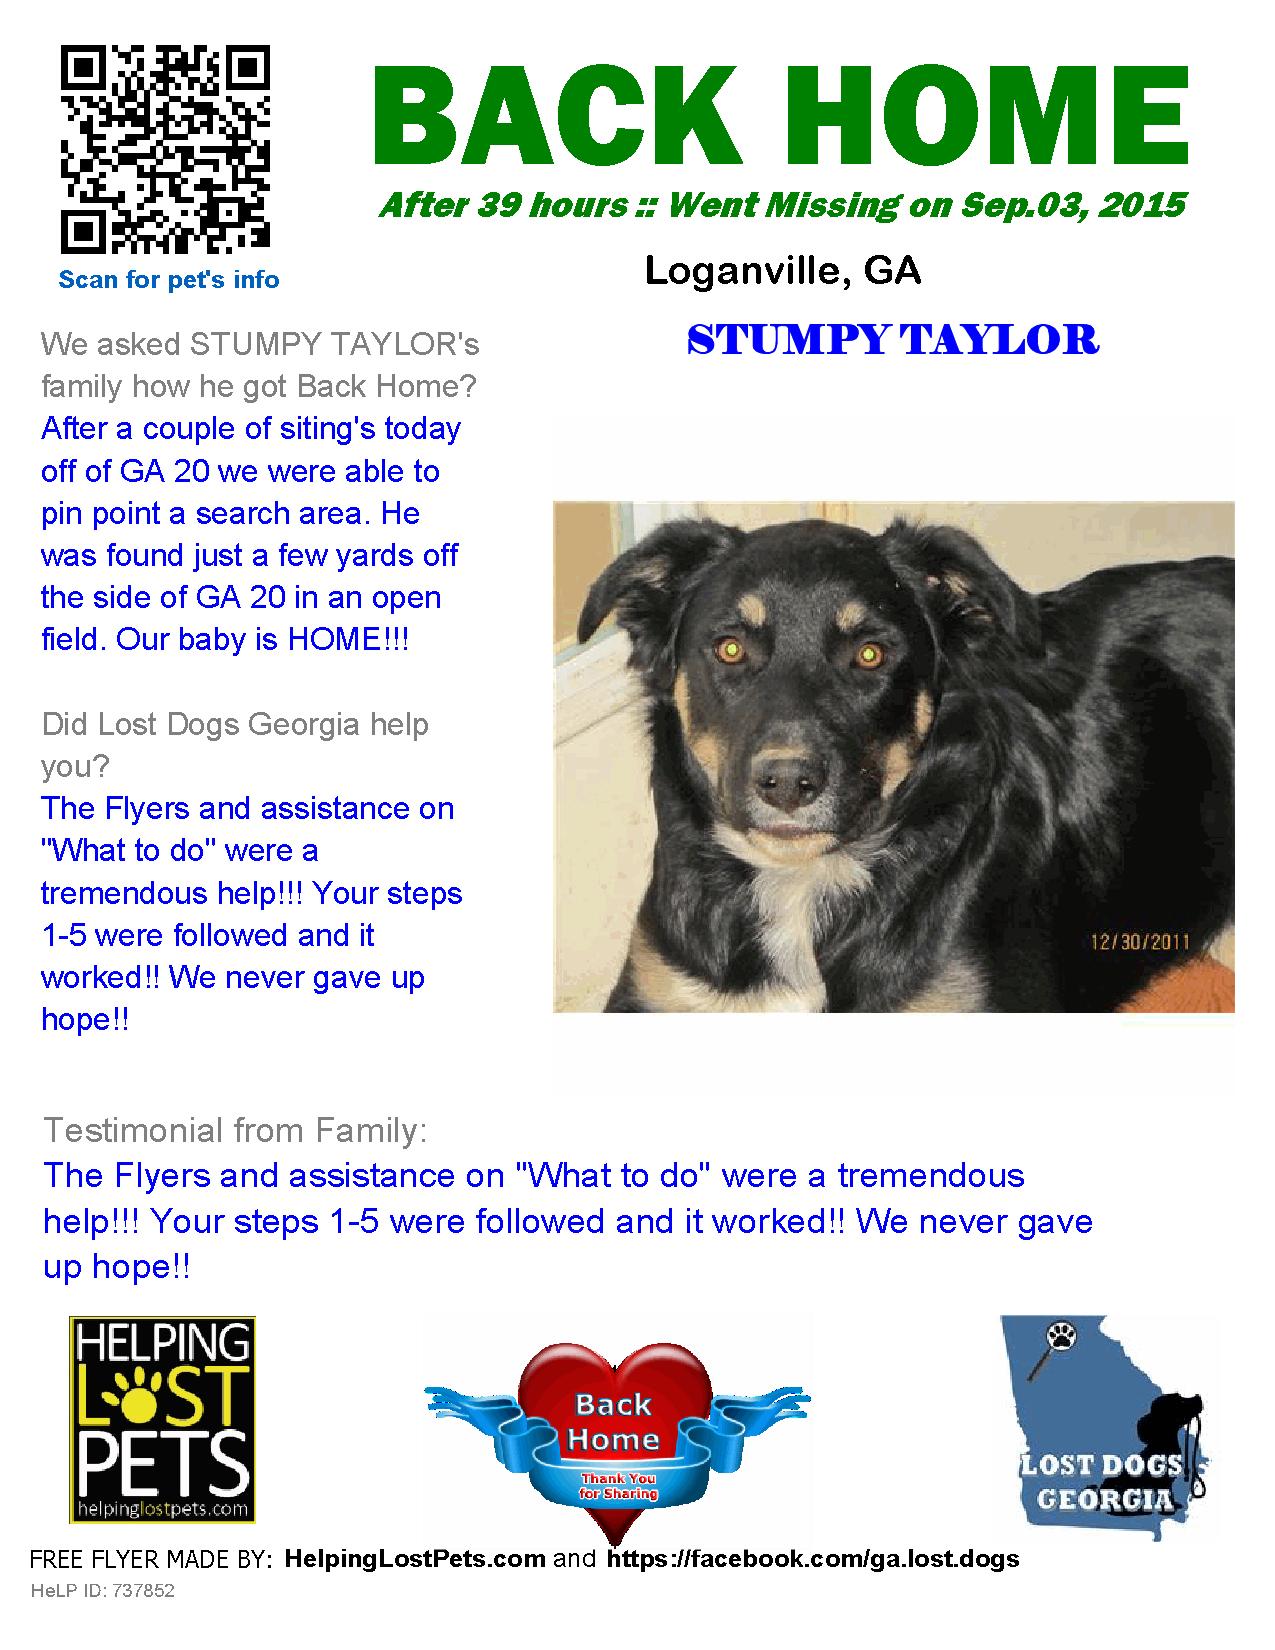 Helping Lost Pets Dog Australian Shepherd Back Home Losing